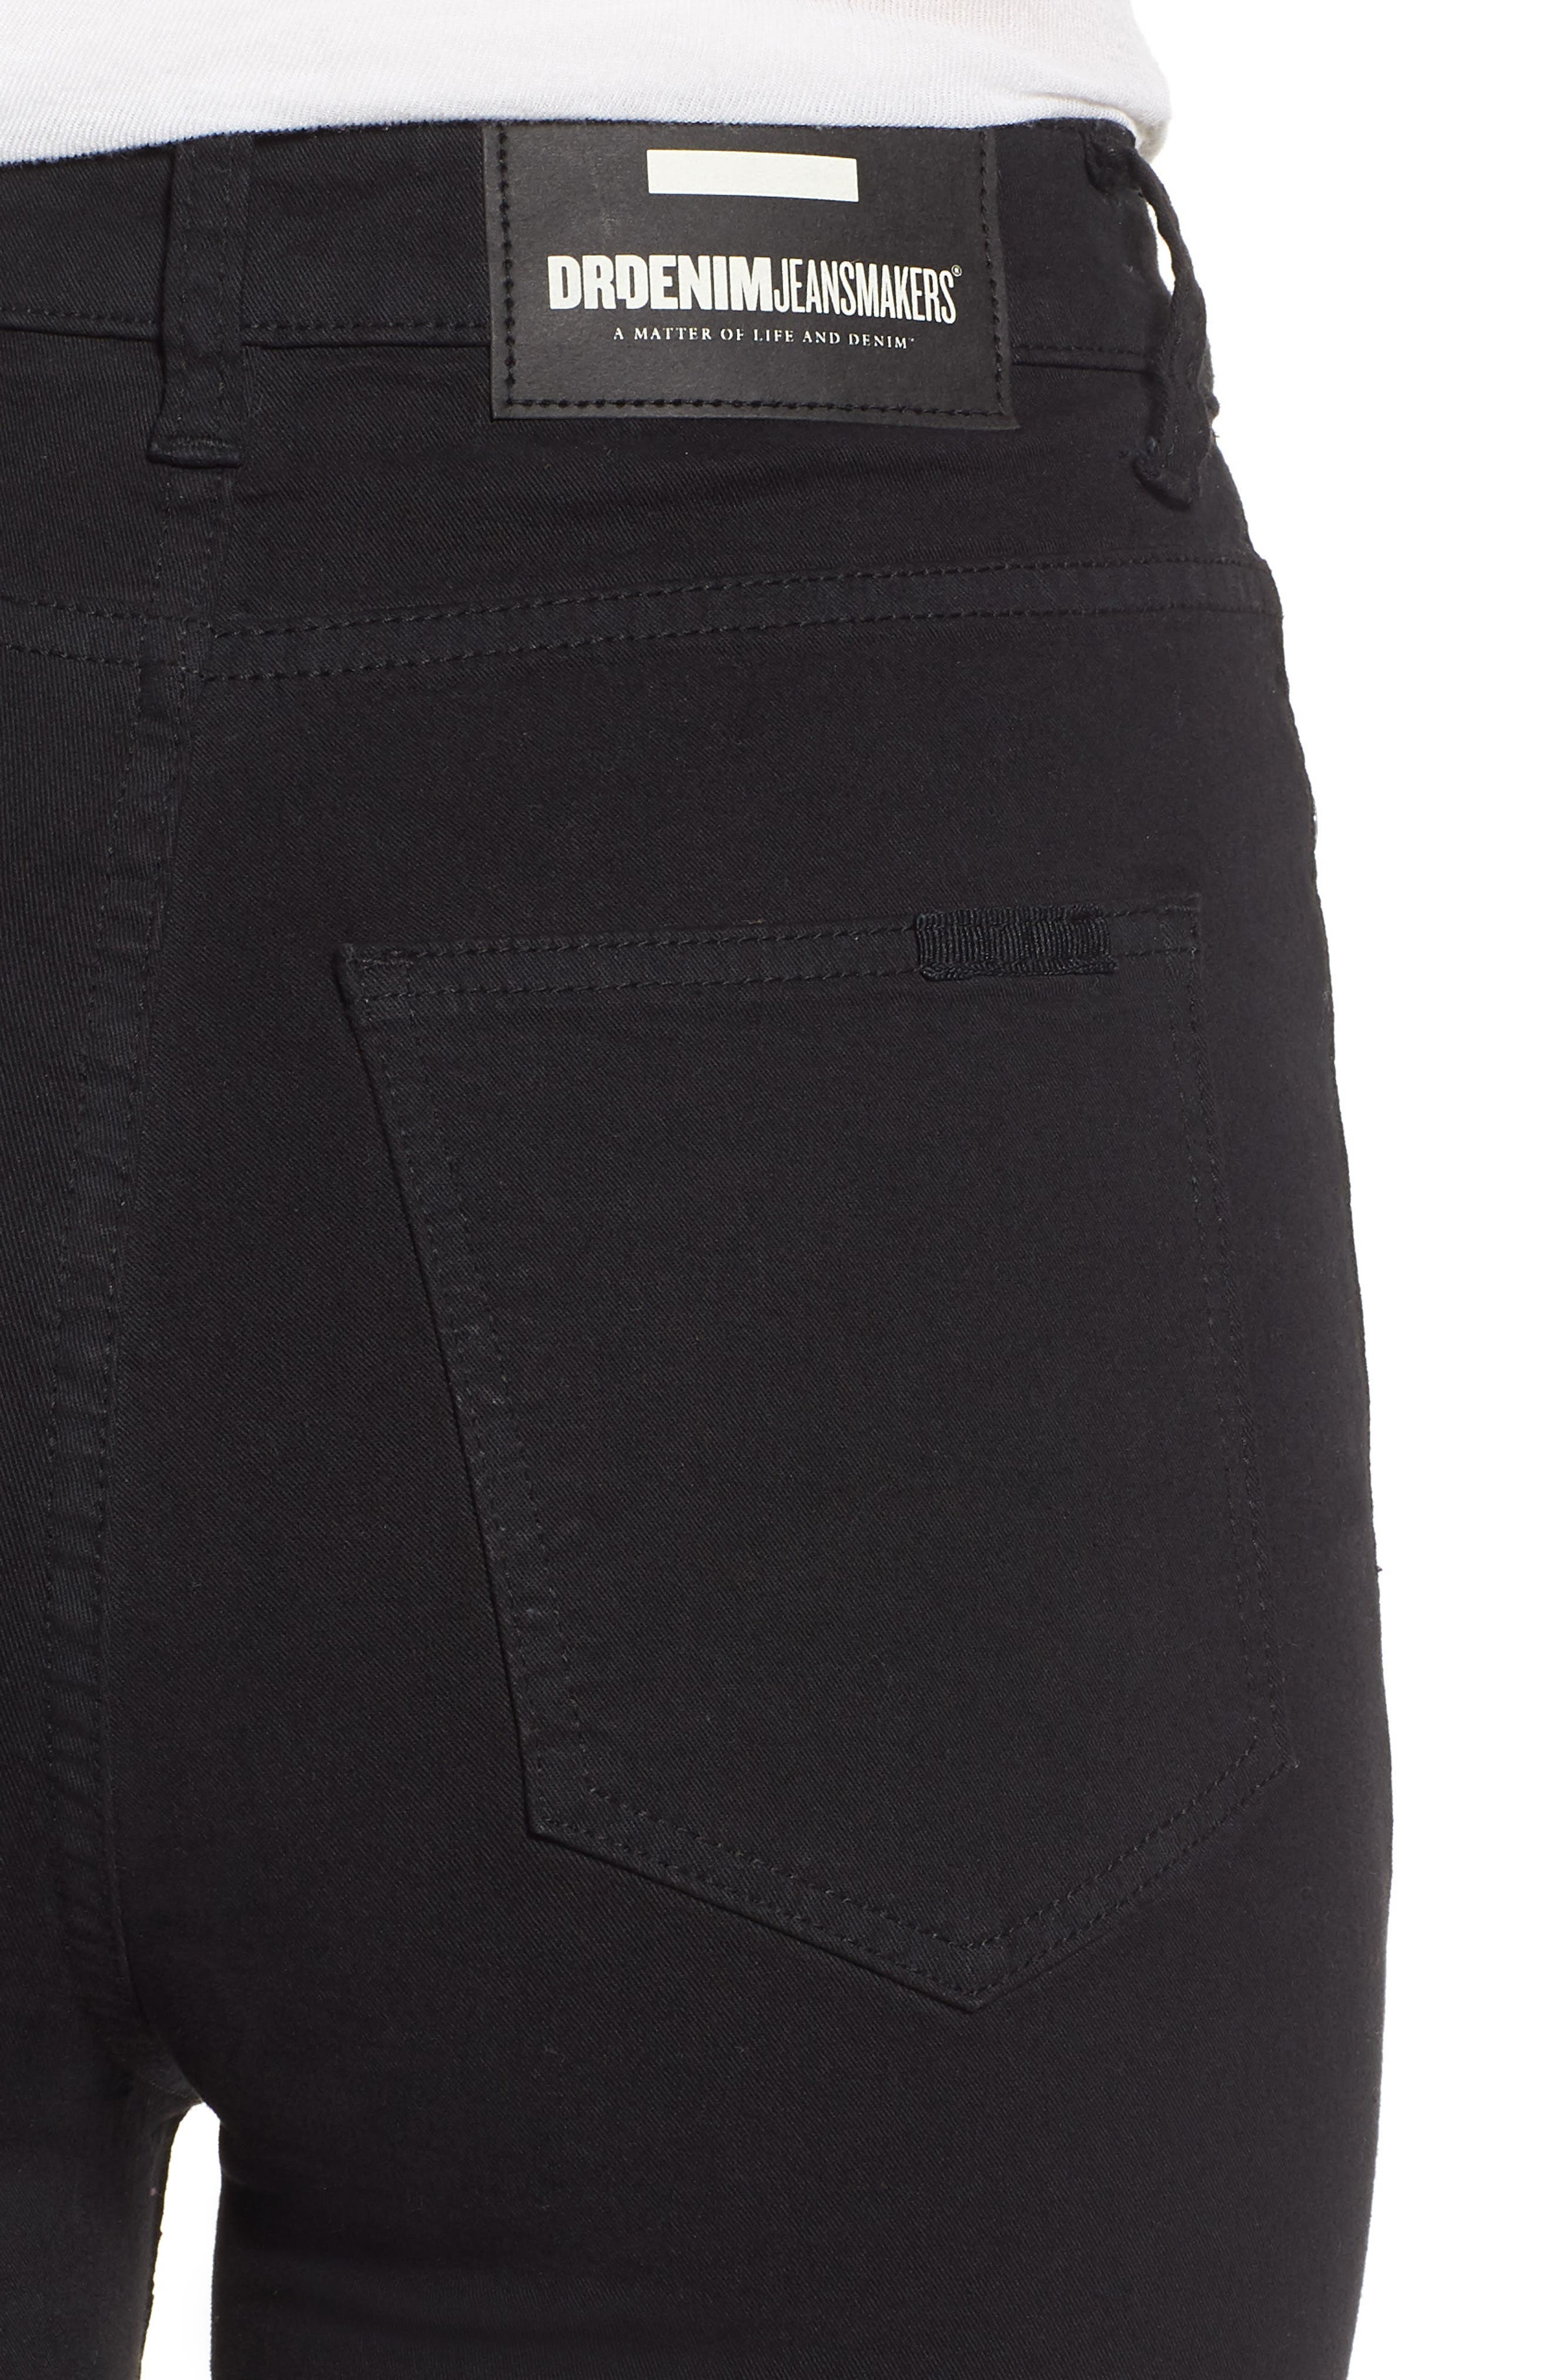 Cropa Cabana Skyhigh Crop Skinny Jeans,                             Alternate thumbnail 4, color,                             001